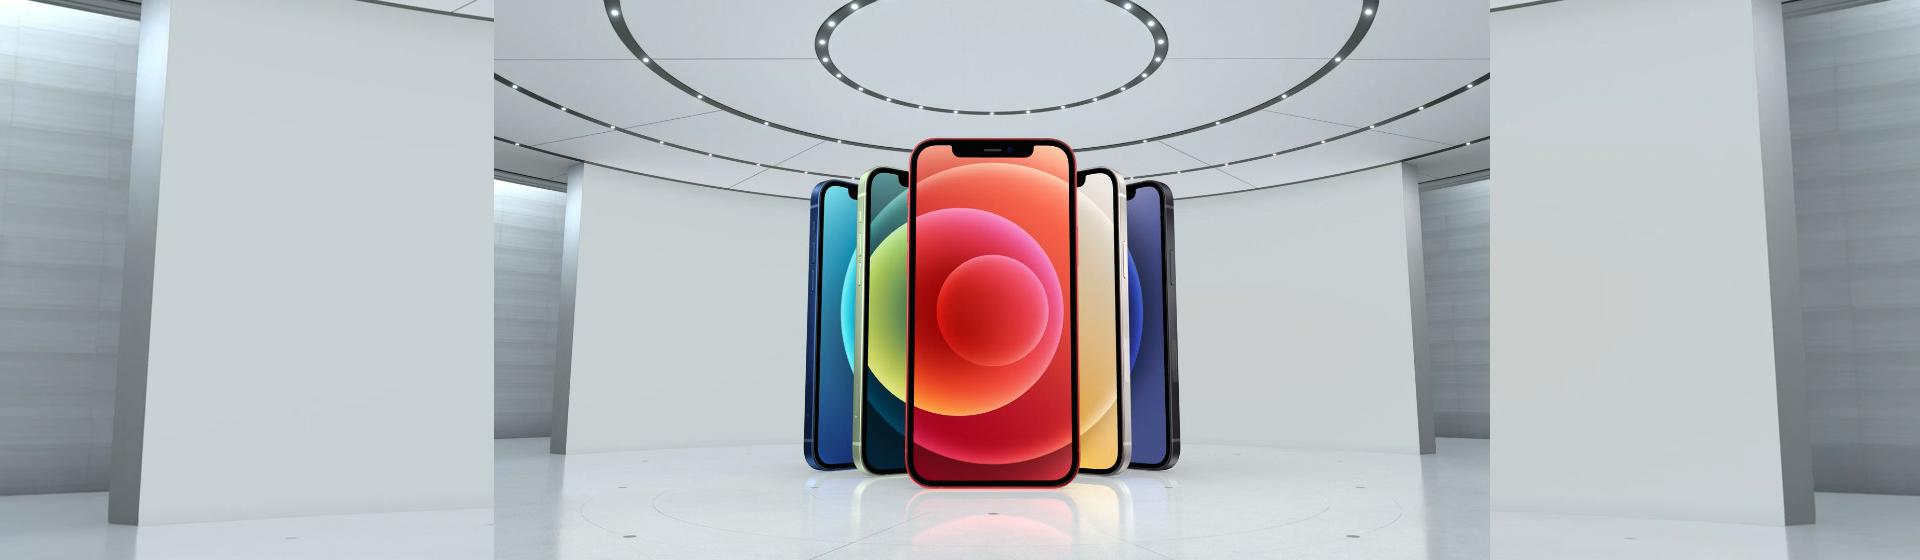 MagSafe: o que é a tecnologia de ímãs do iPhone 12?